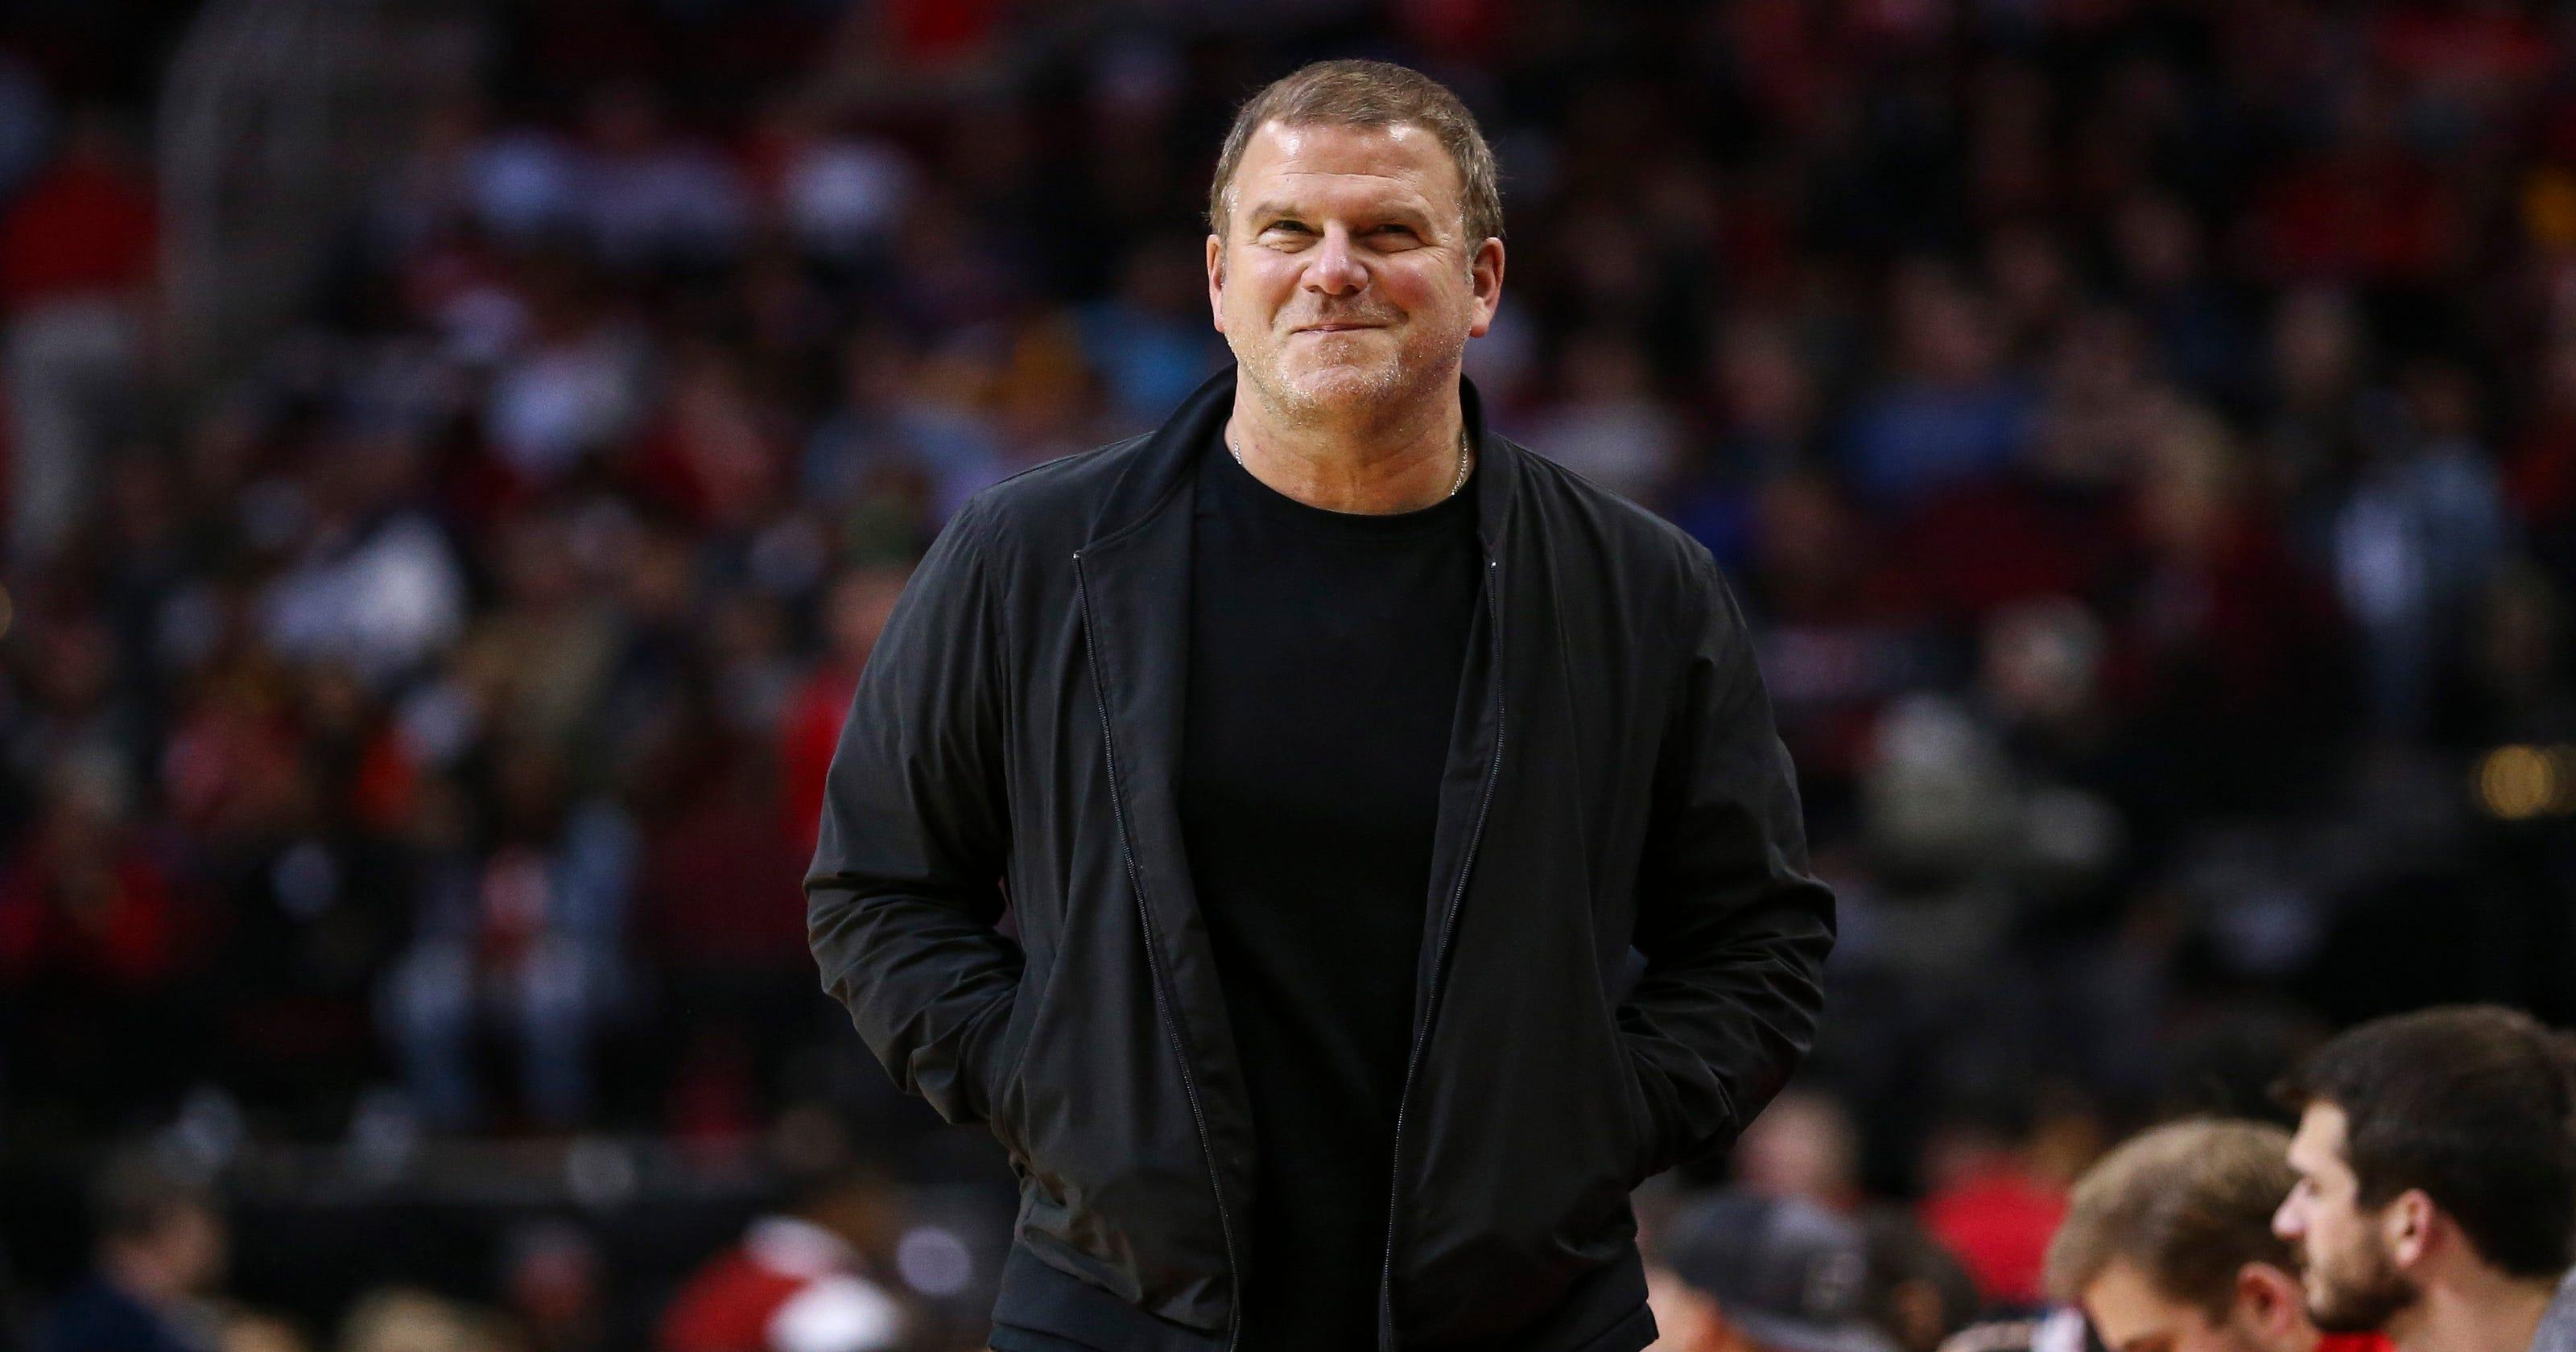 Houston Rockets owner Tilman Fertitta weighs in on struggles fc3bcb6f5